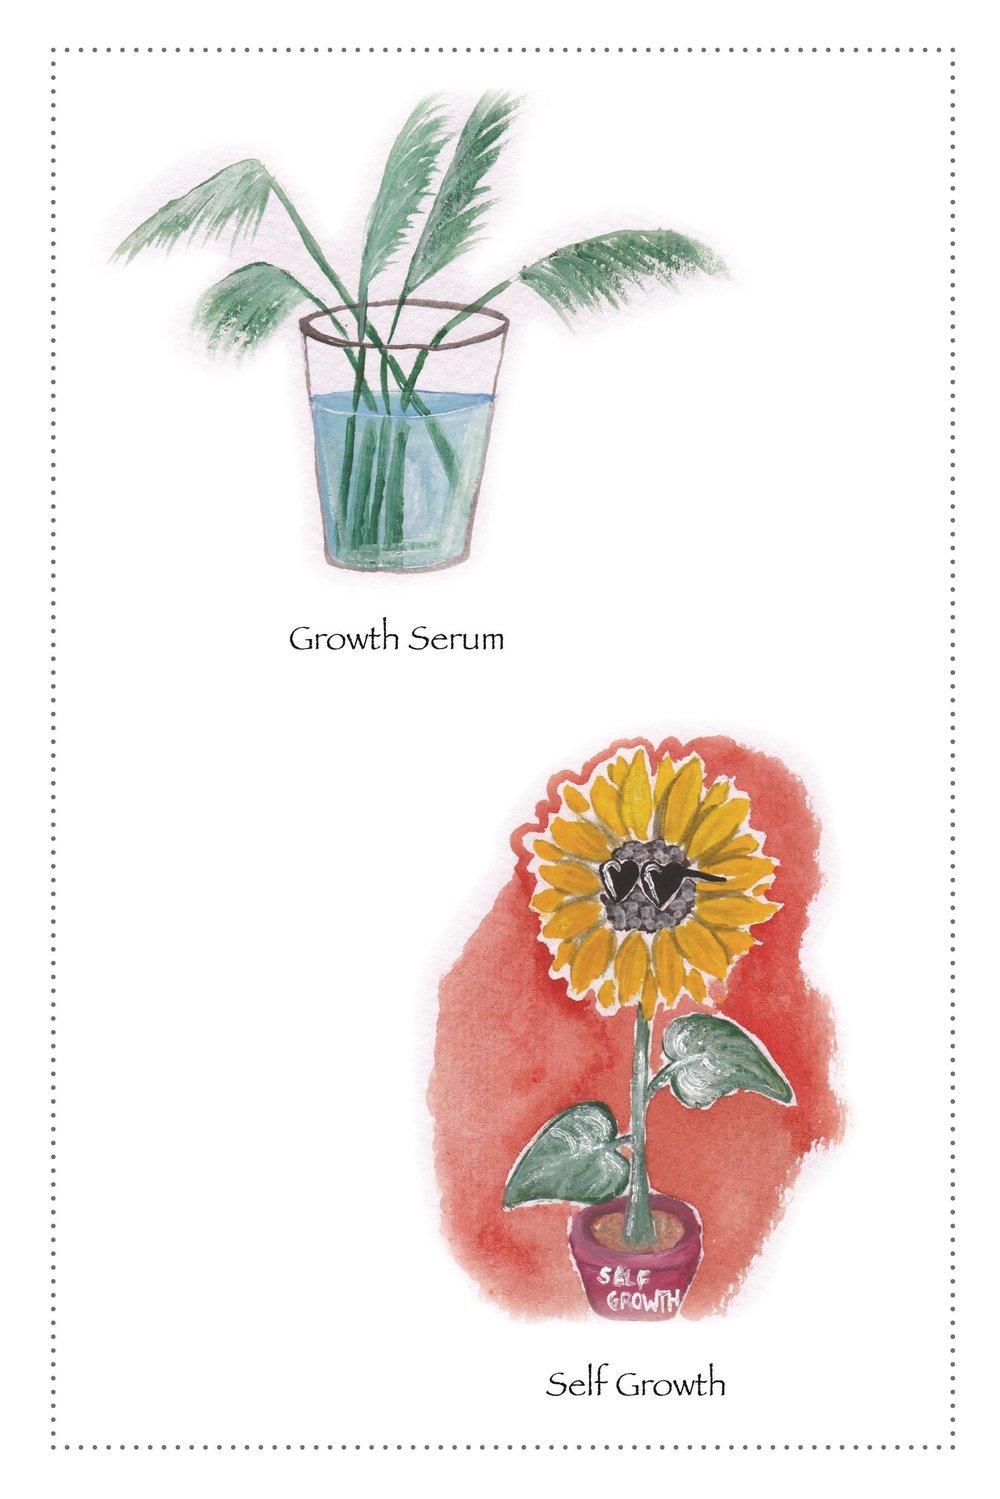 GROWTH SERUM & SELF GROWTH300.jpg